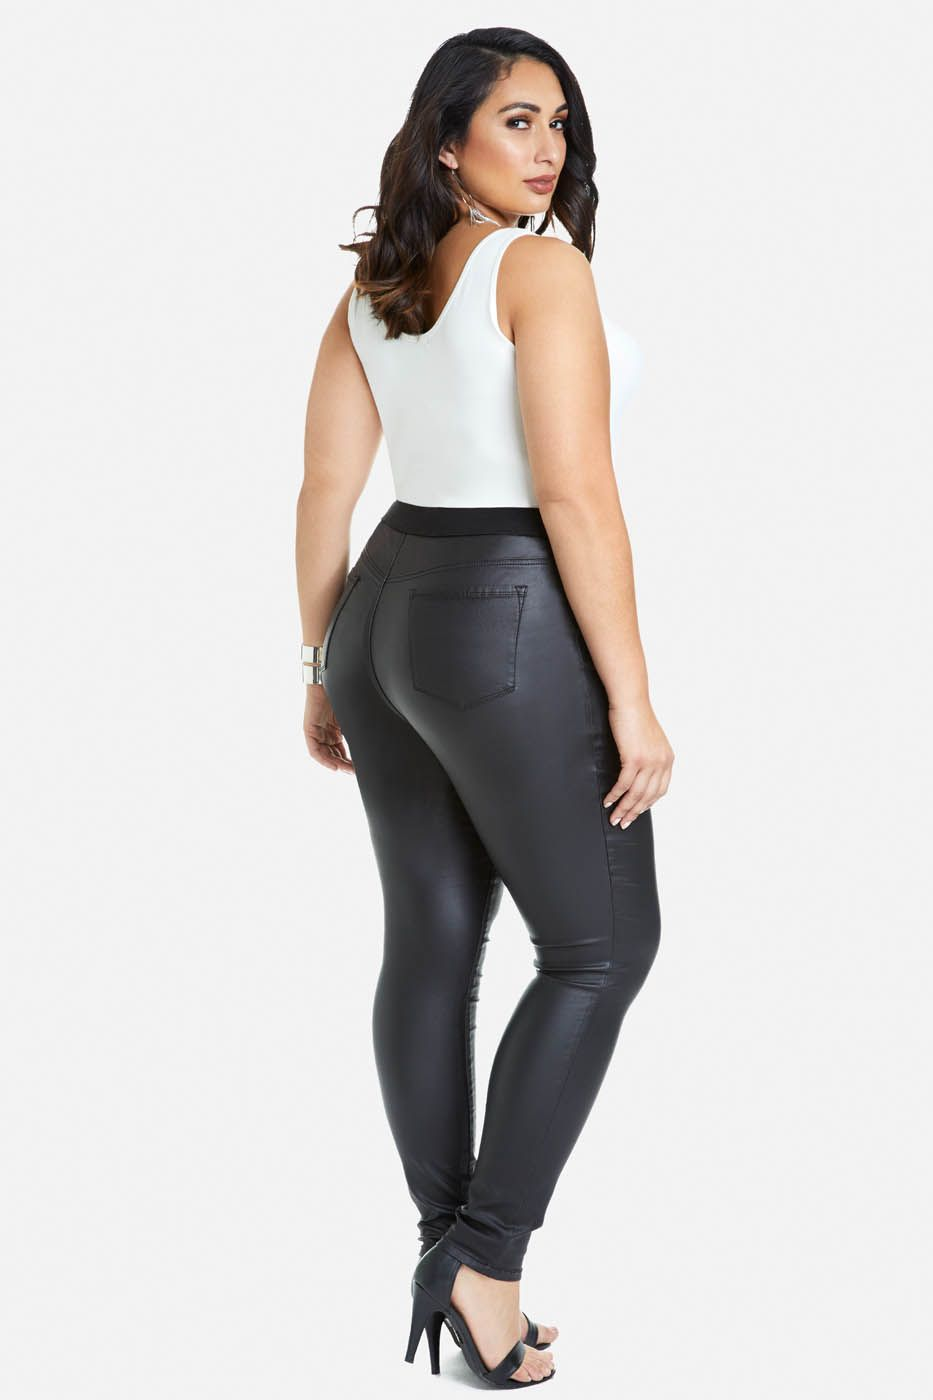 Plus Size Zak Faux Leather Pull-On Pants | Leggings - Skinny ...